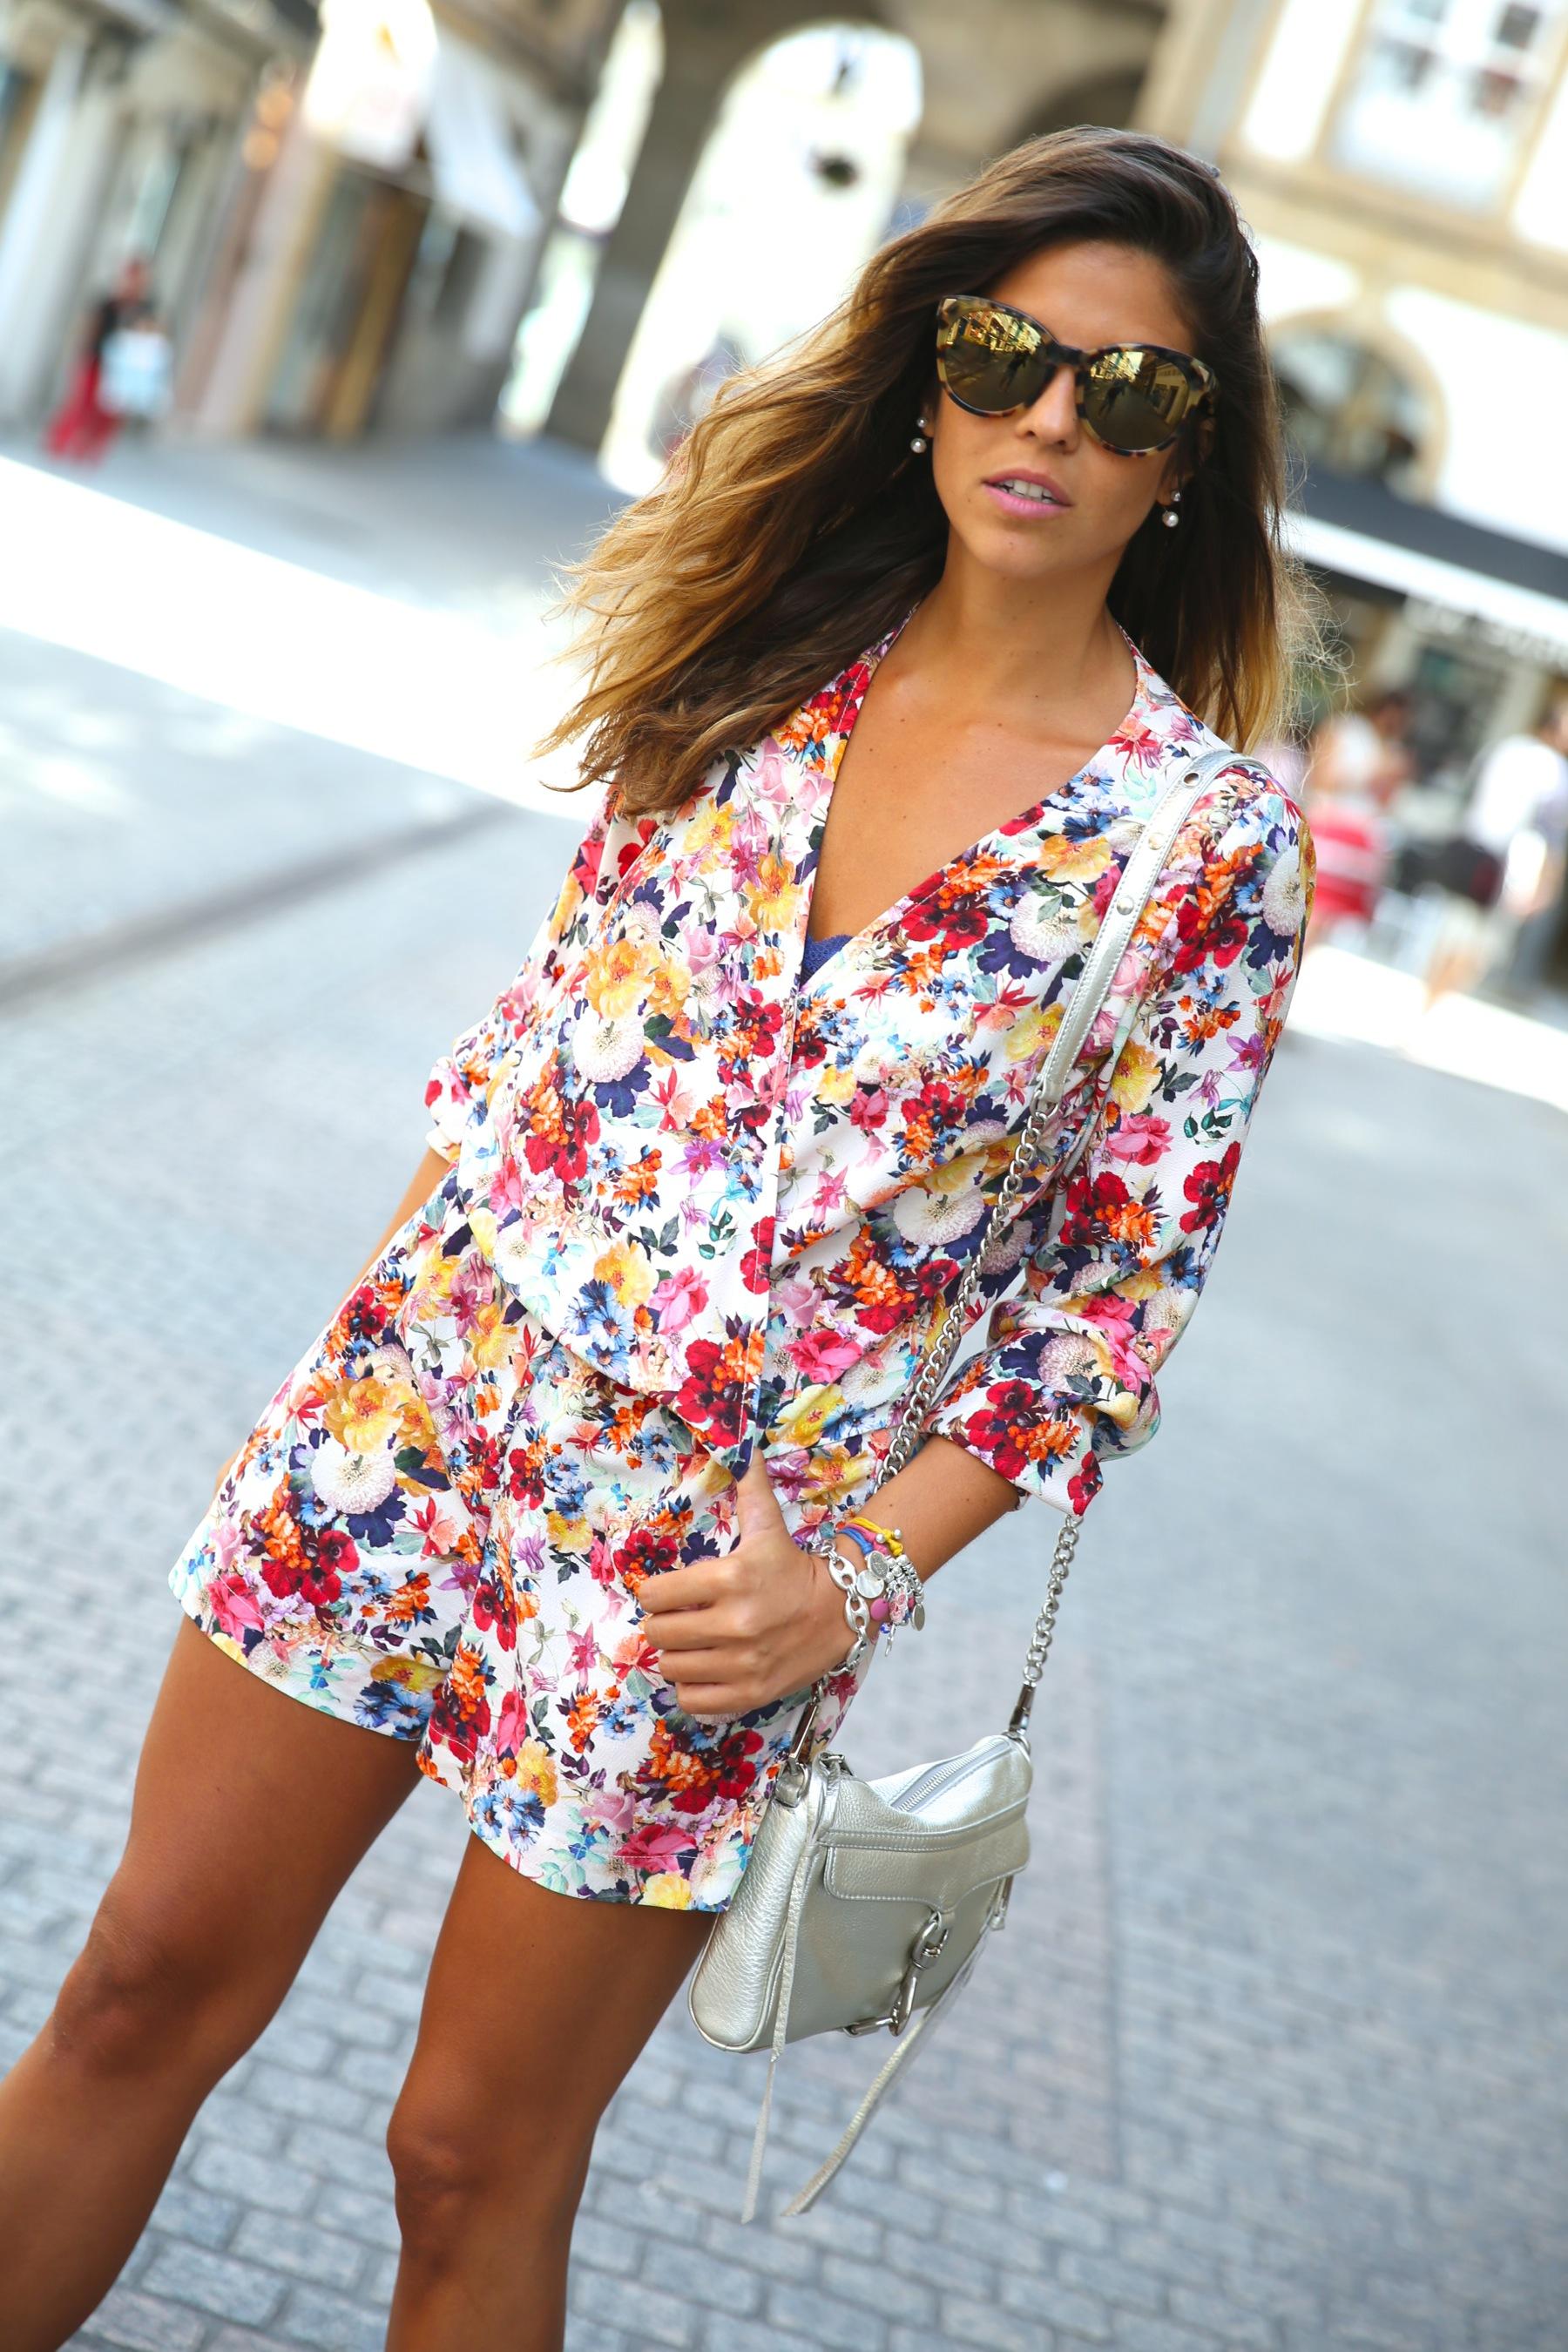 trendy_taste-look-outfit-street_style-ootd-blog-blogger-fashion_spain-moda_españa-mono-flores-flower_print-verano-summer-overall-la_coruña-3